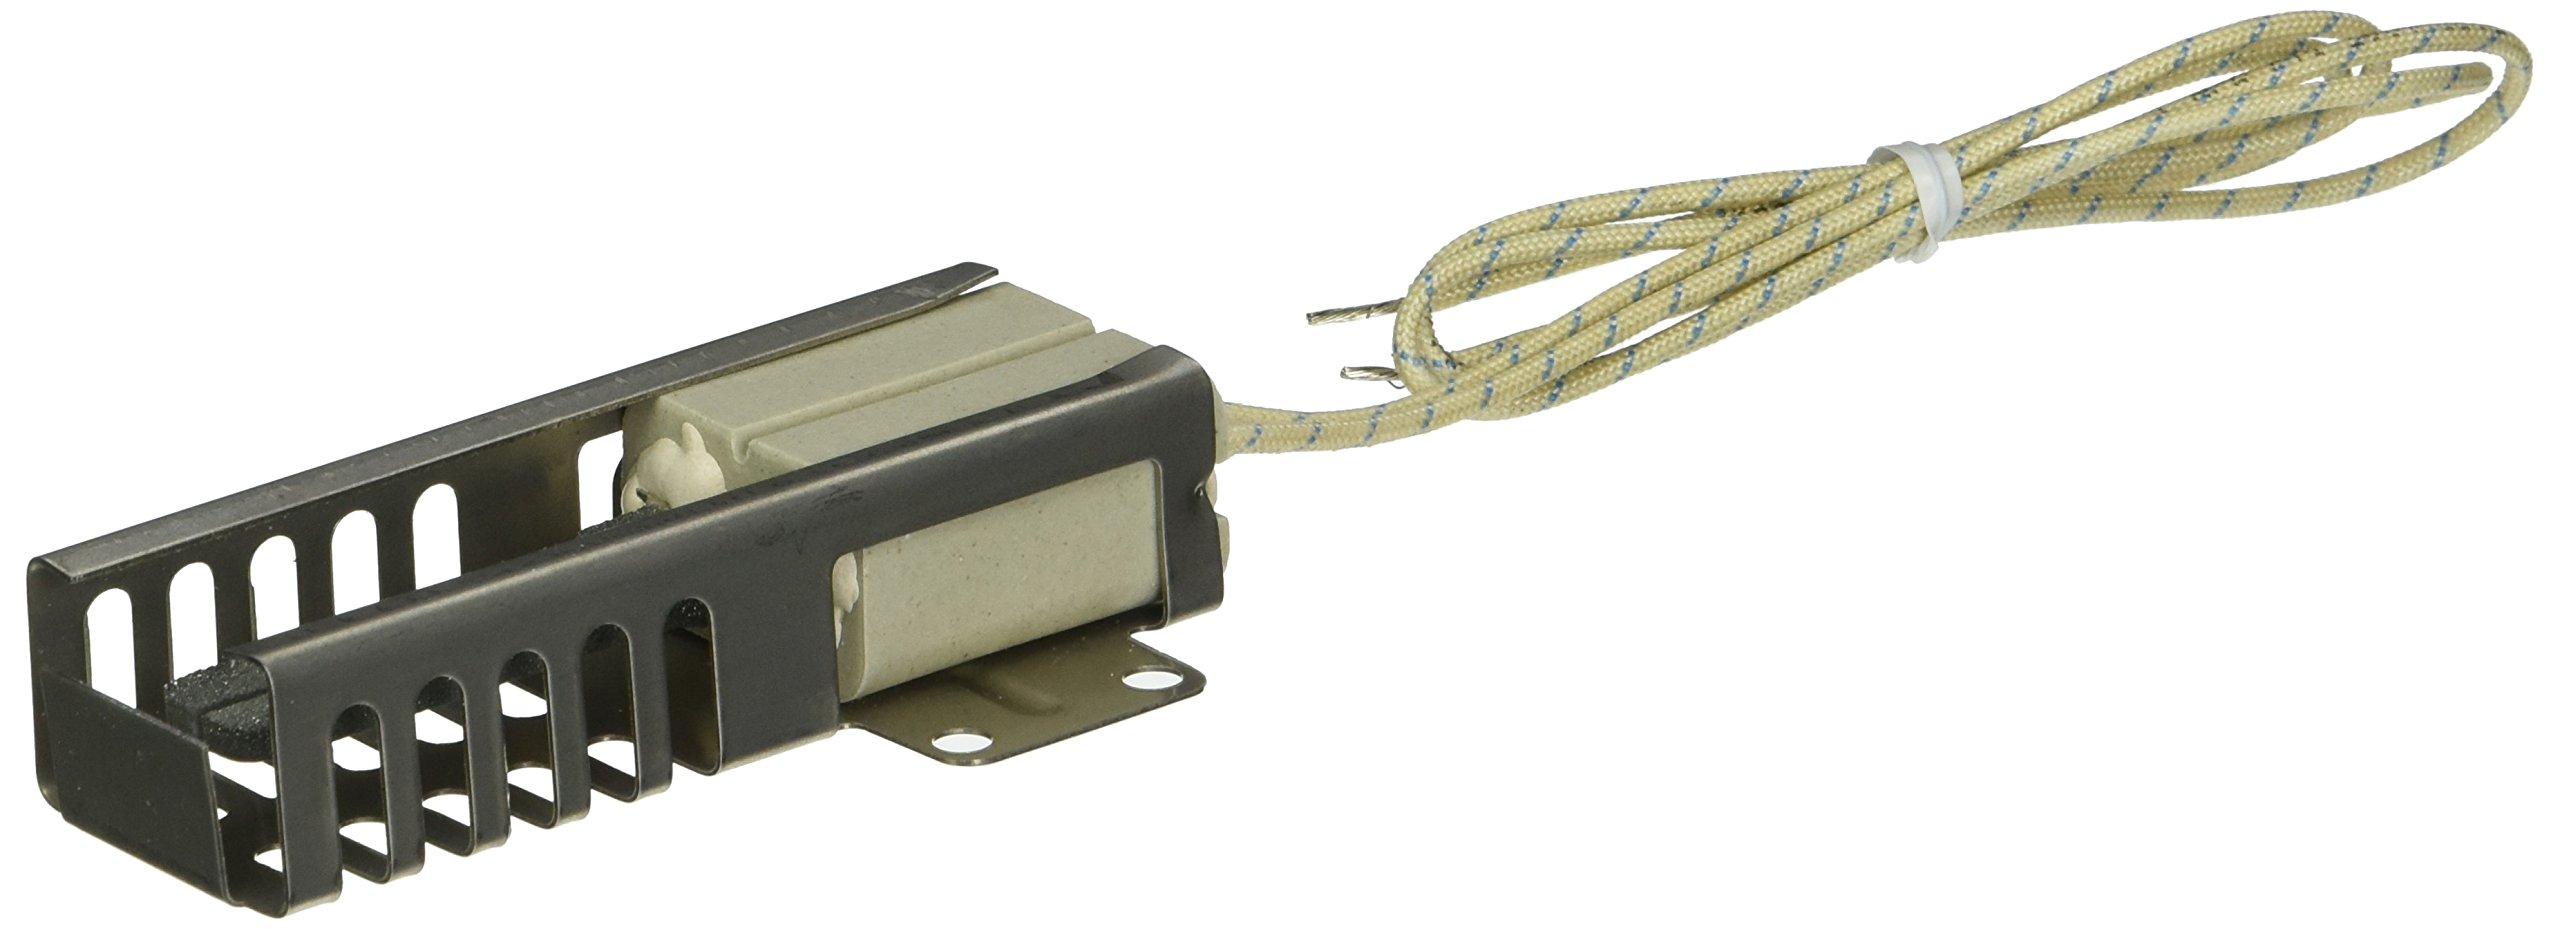 Frigidaire 5303935066 Igniter For Range Wiring Book Home Depot